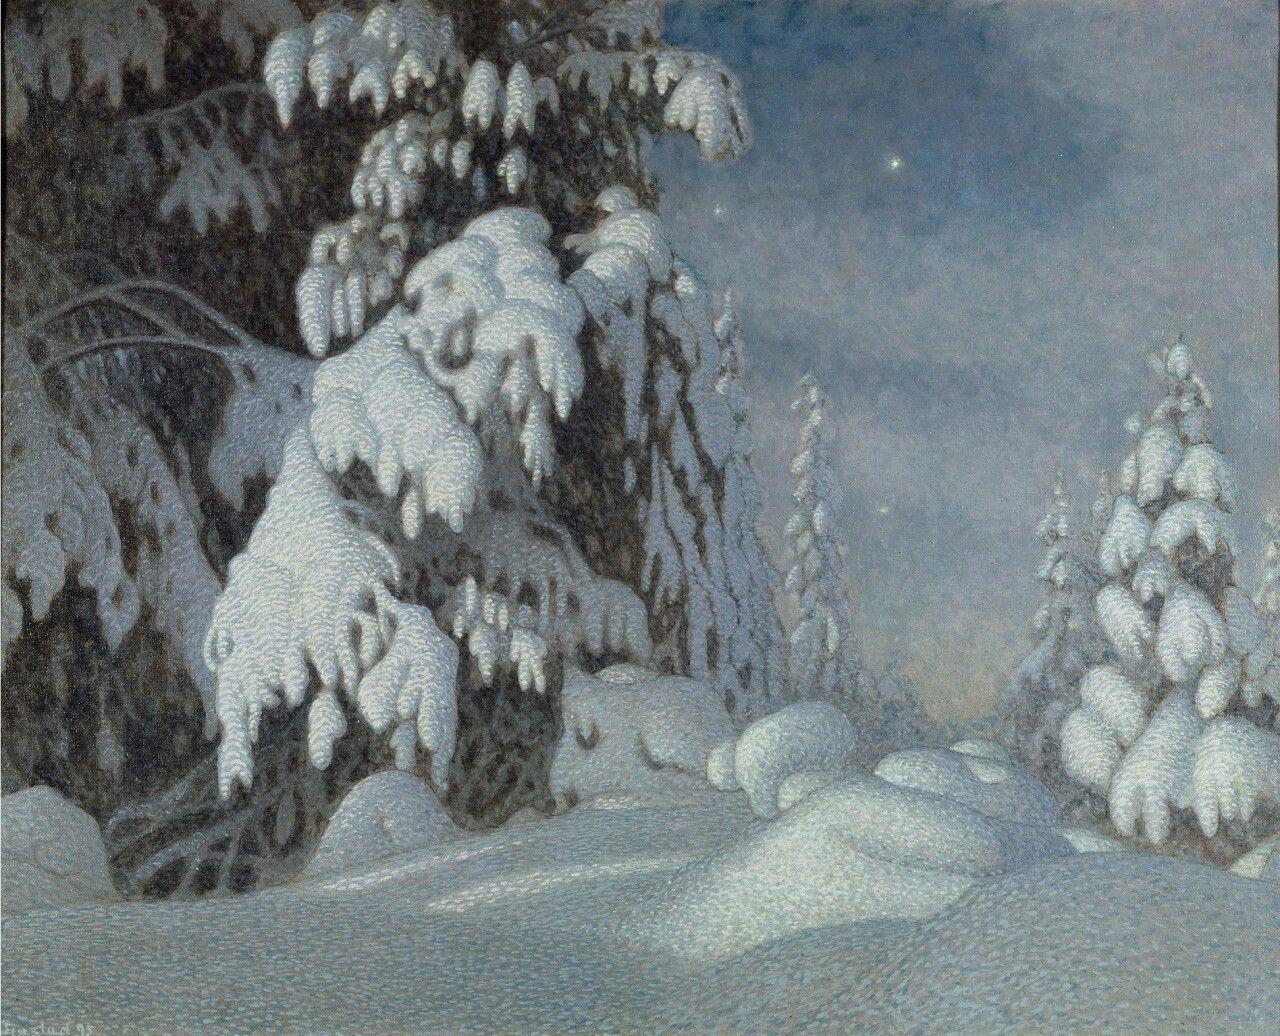 Gustaf Fjæstad (Swedish, 1868-1948), Winter Moonlight, 1895. Oil on canvas. Nationalmuseum, Stockholm.